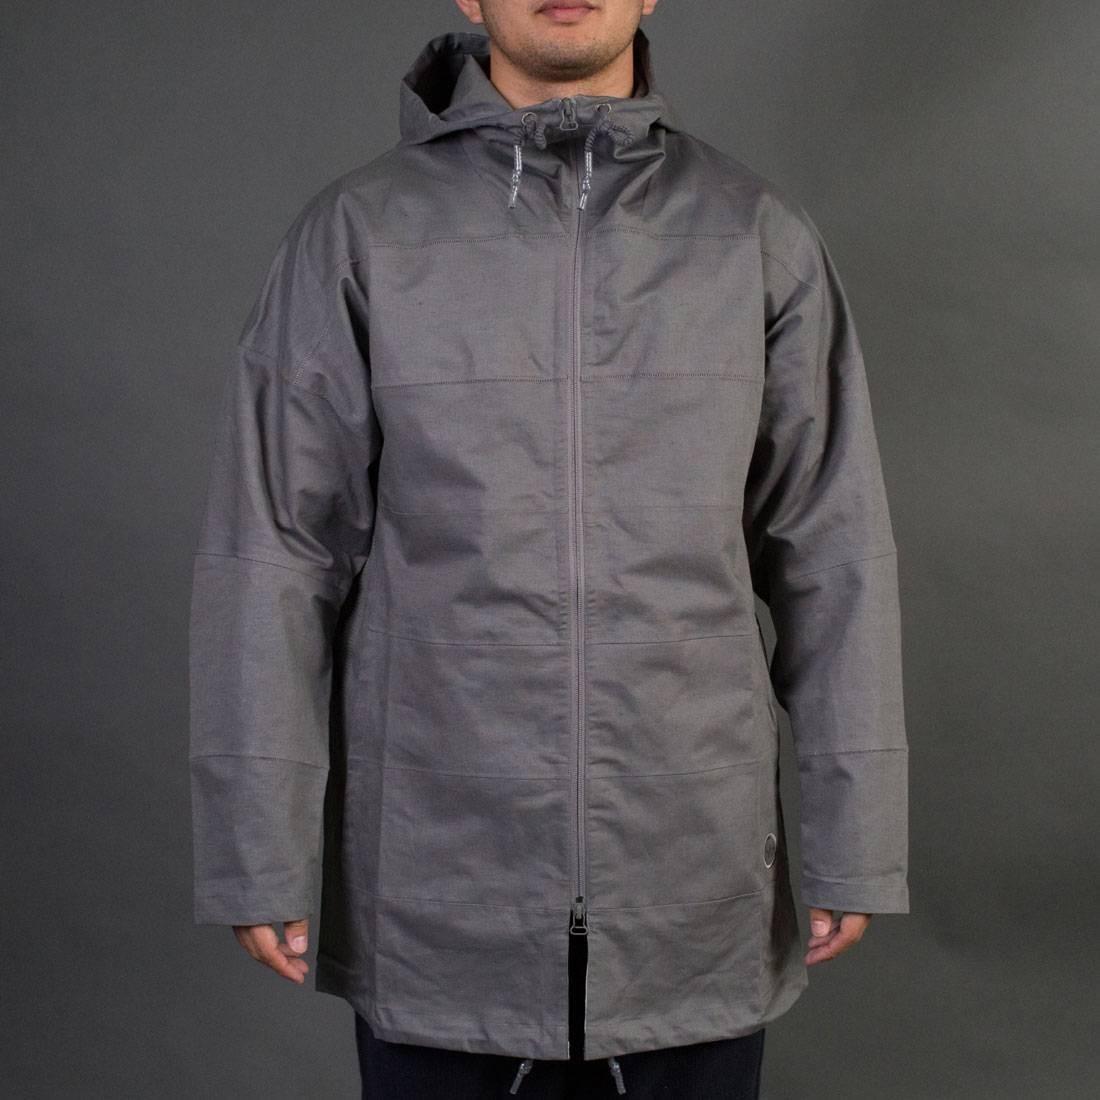 Adidas x Wings + Horns Men Tech Parka Jacket (gray / ash)